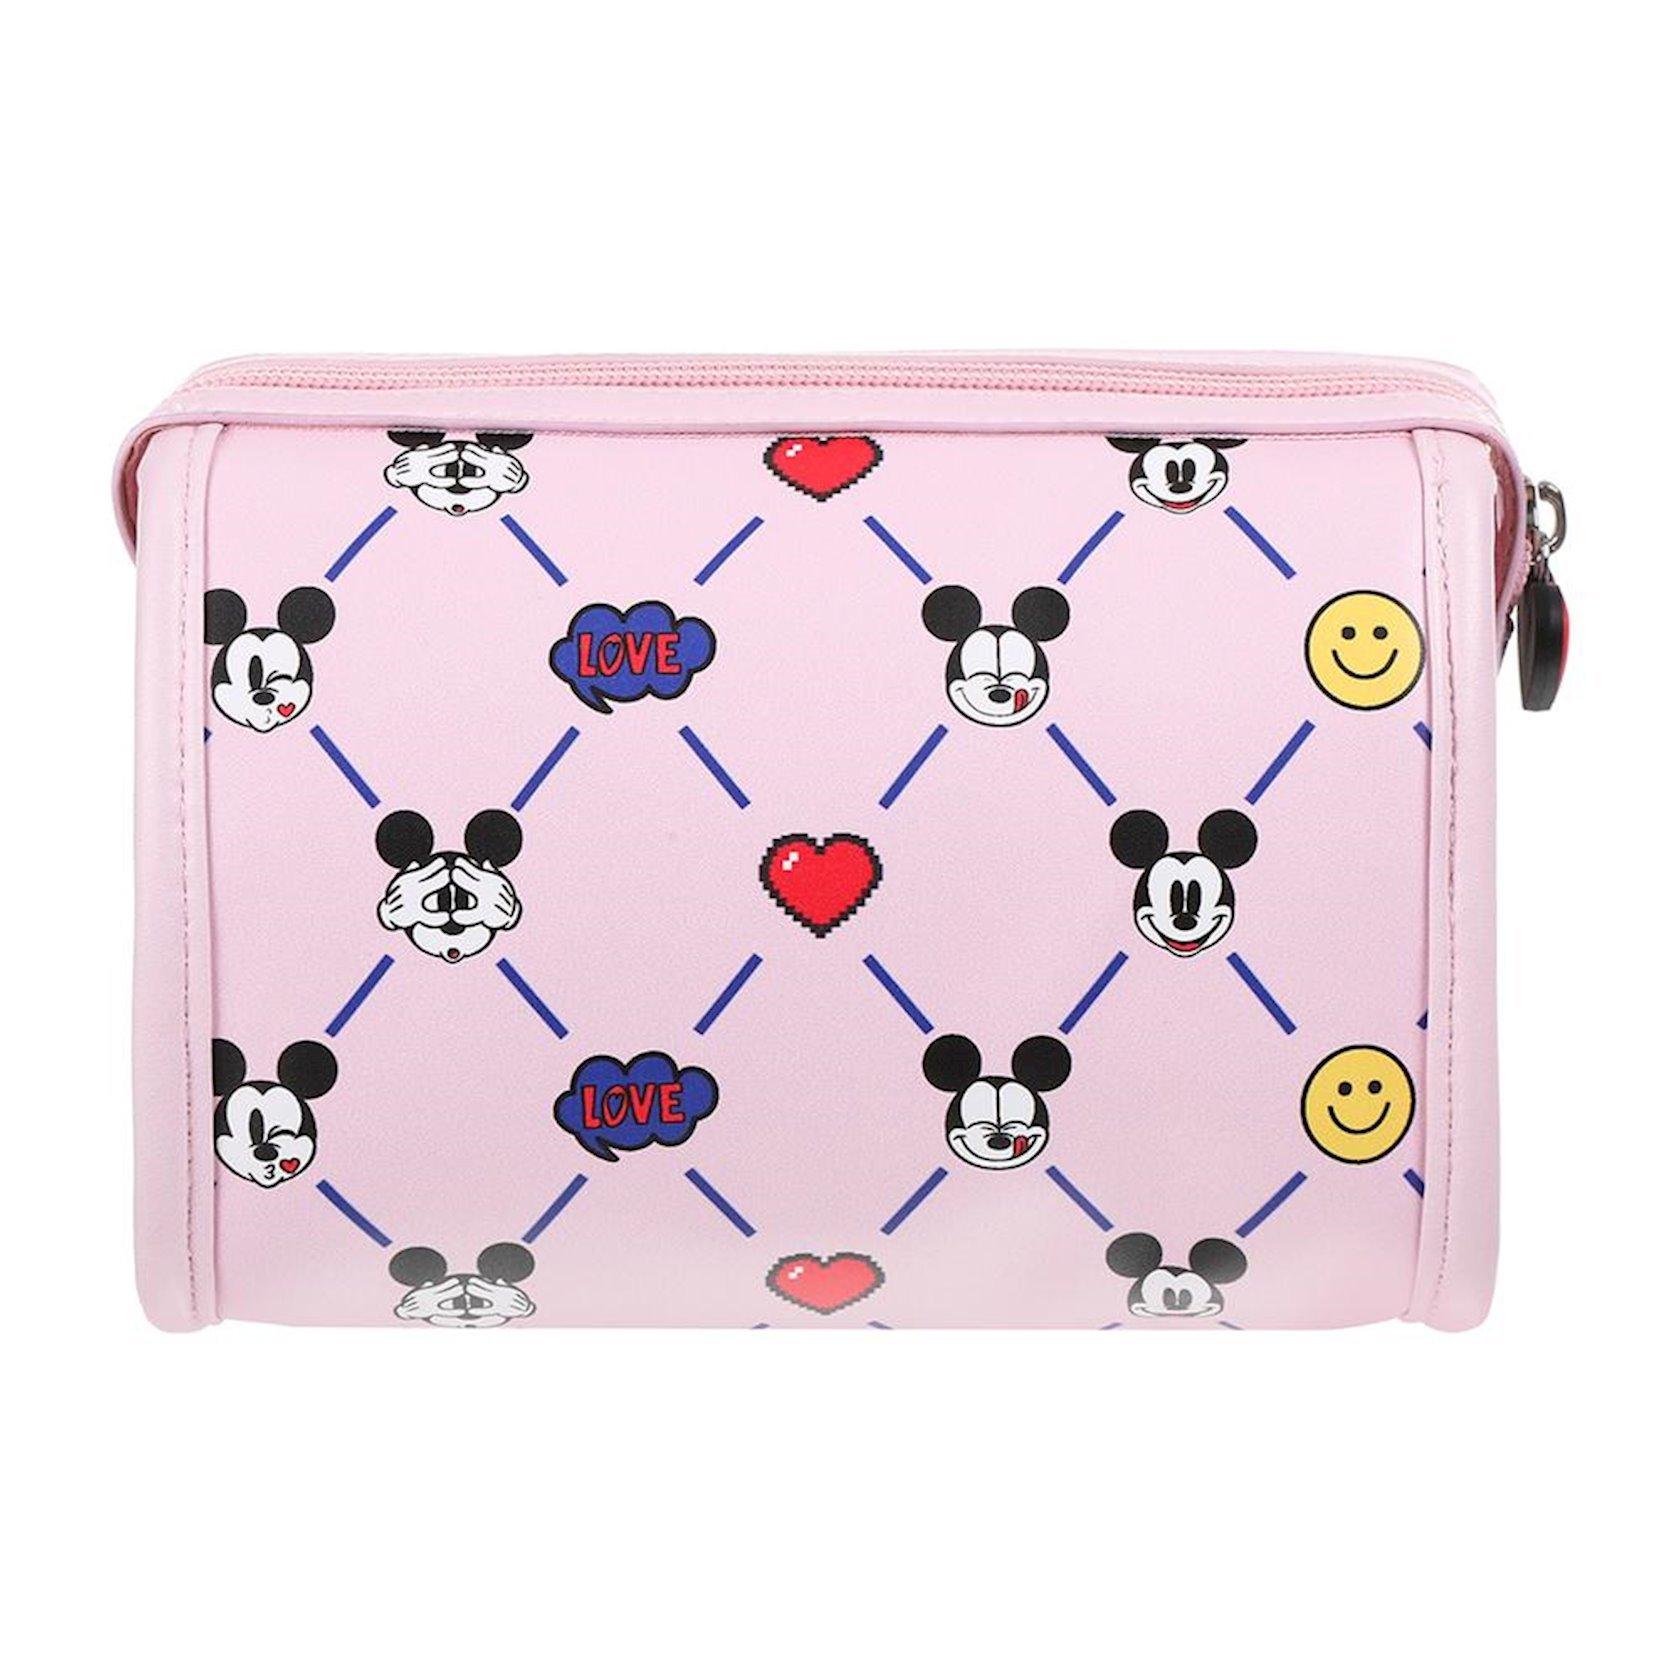 Kosmetika çantası Miniso Mickey Mouse Disney, Çəhrayı